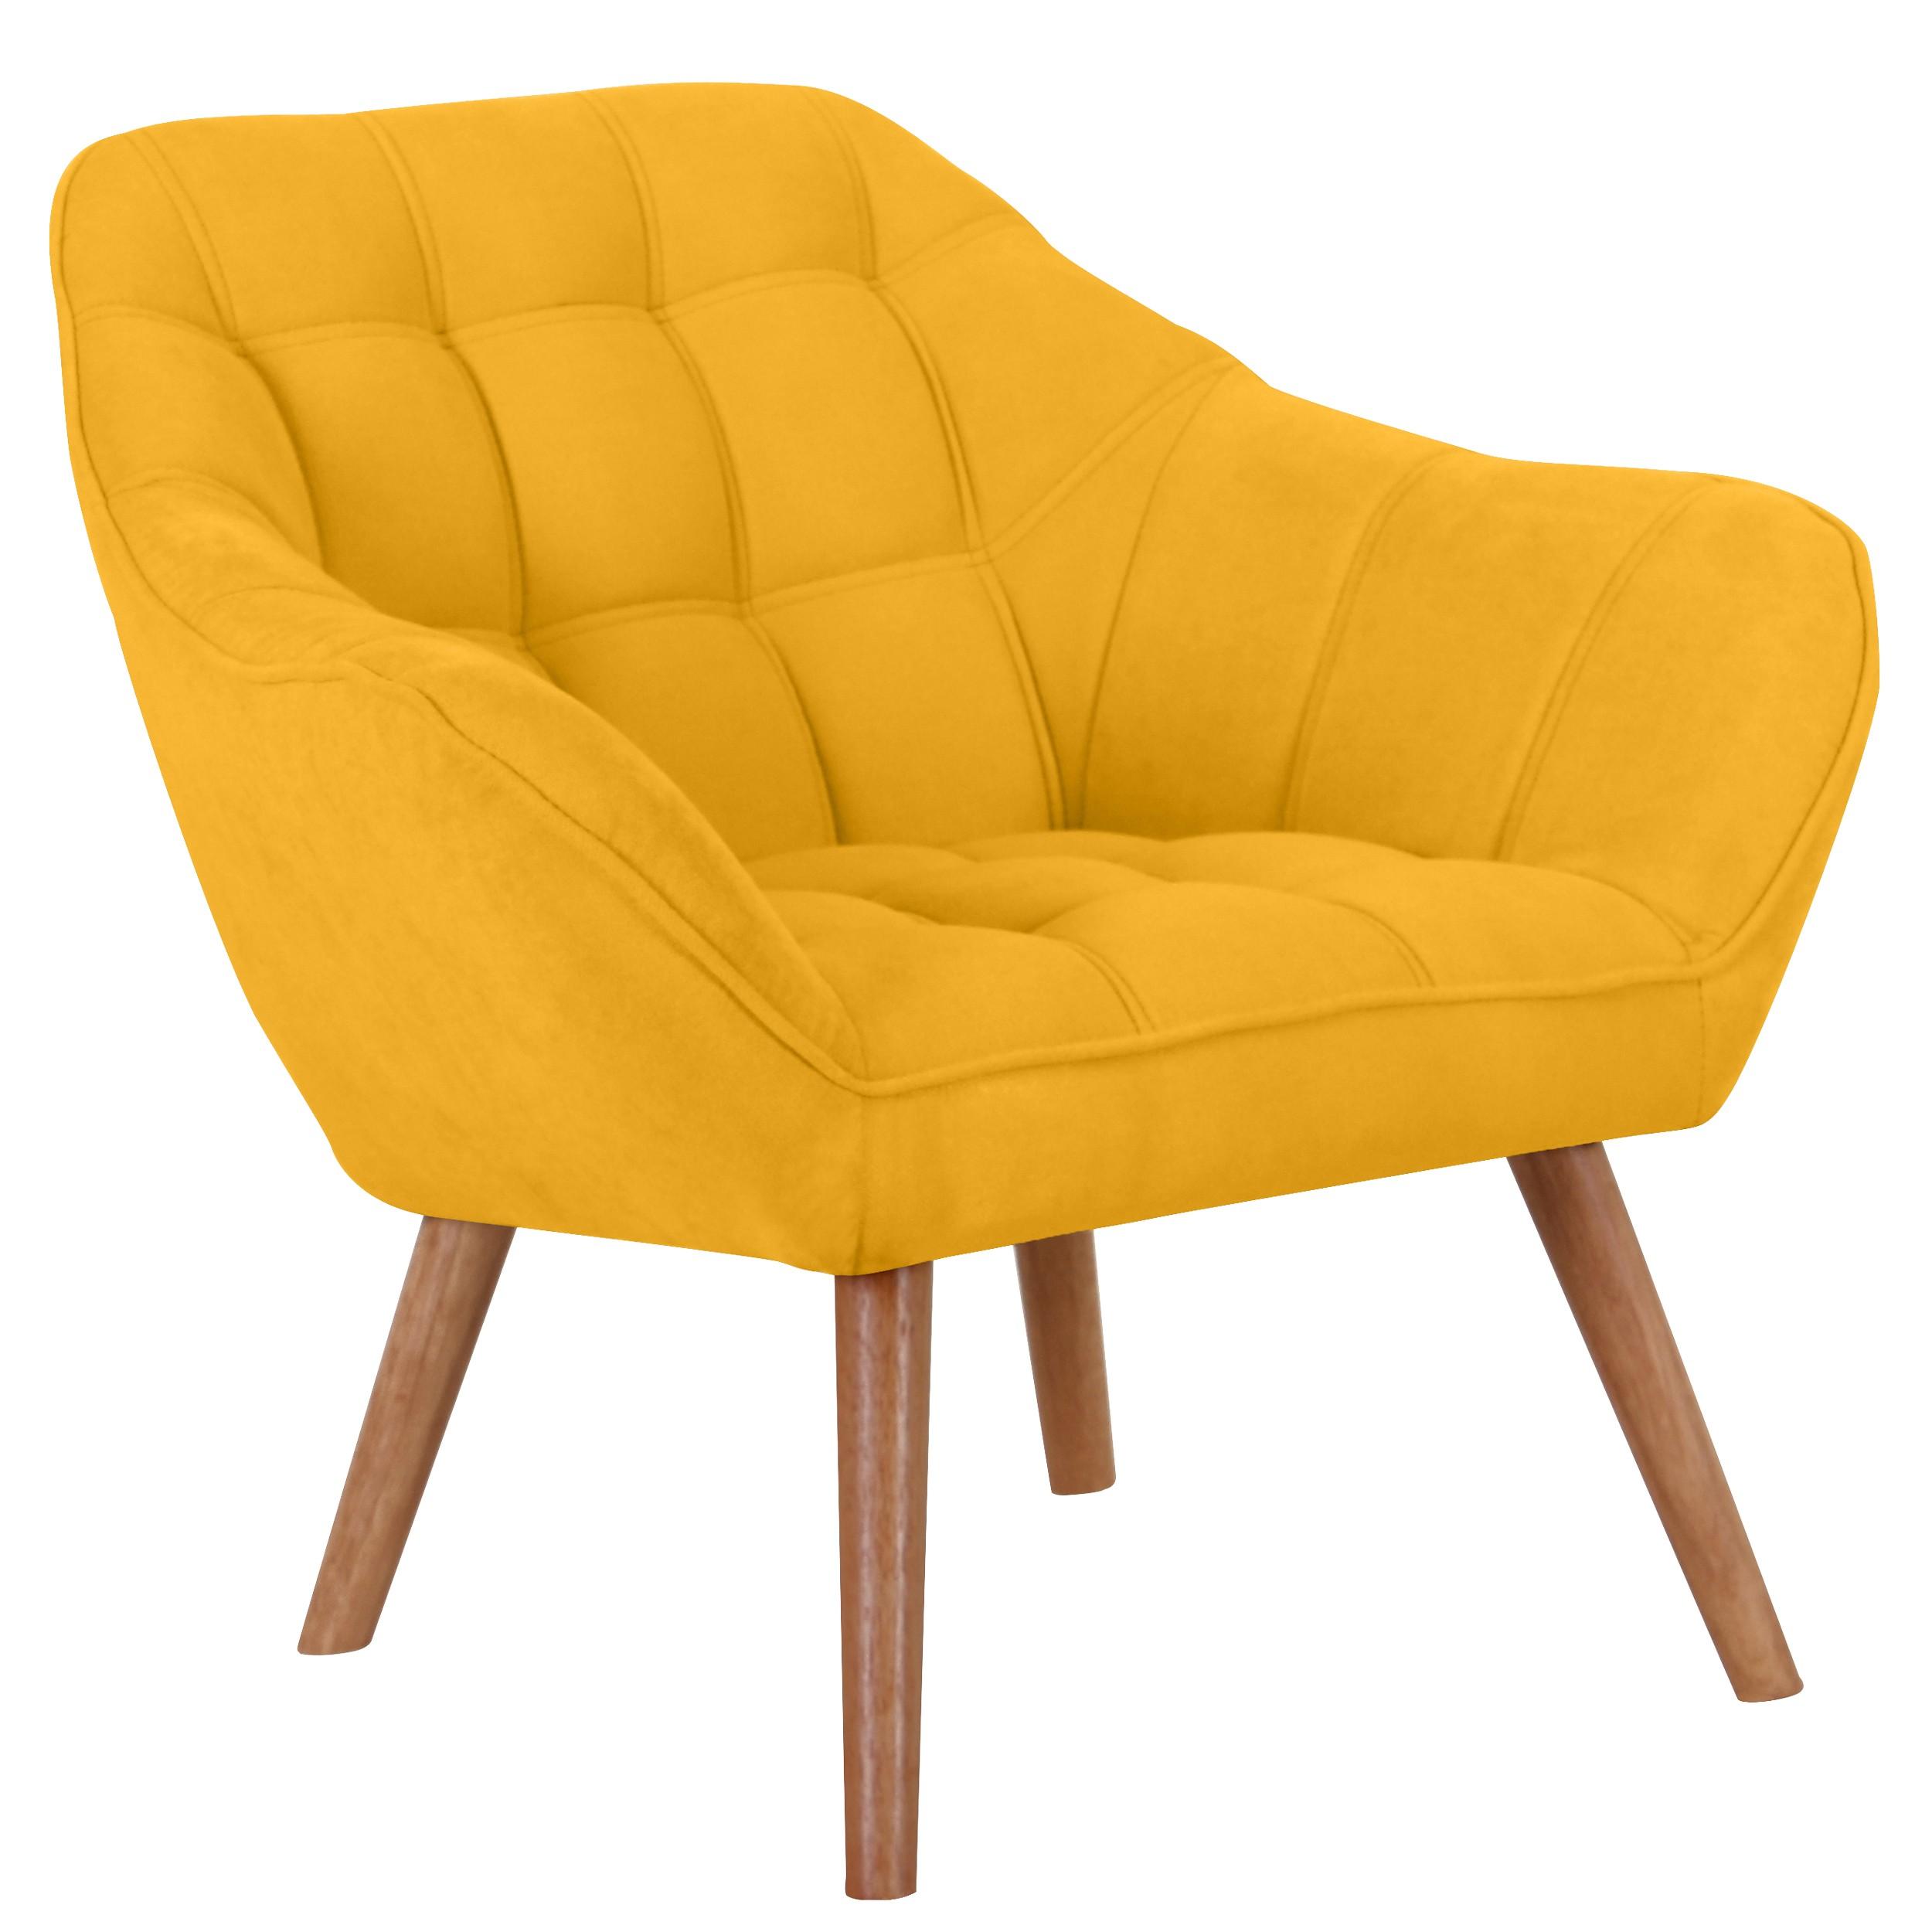 acheter fauteuil jaune tissu previous - Fauteuil En Tissu